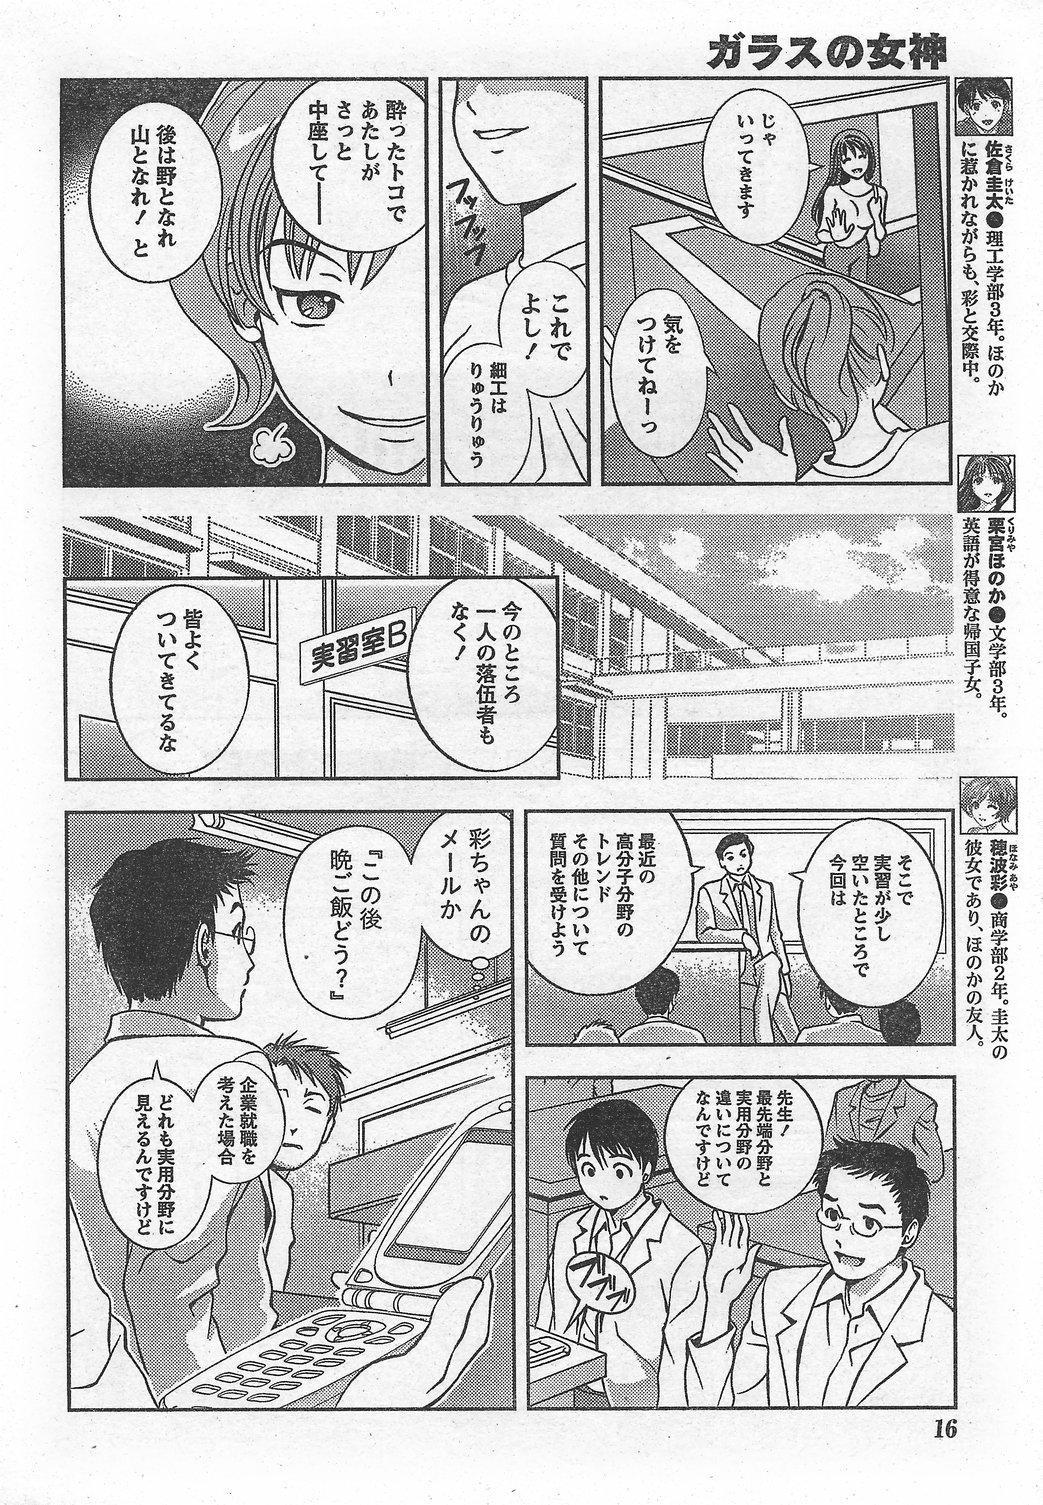 Monthly Vitaman 2007-10 15